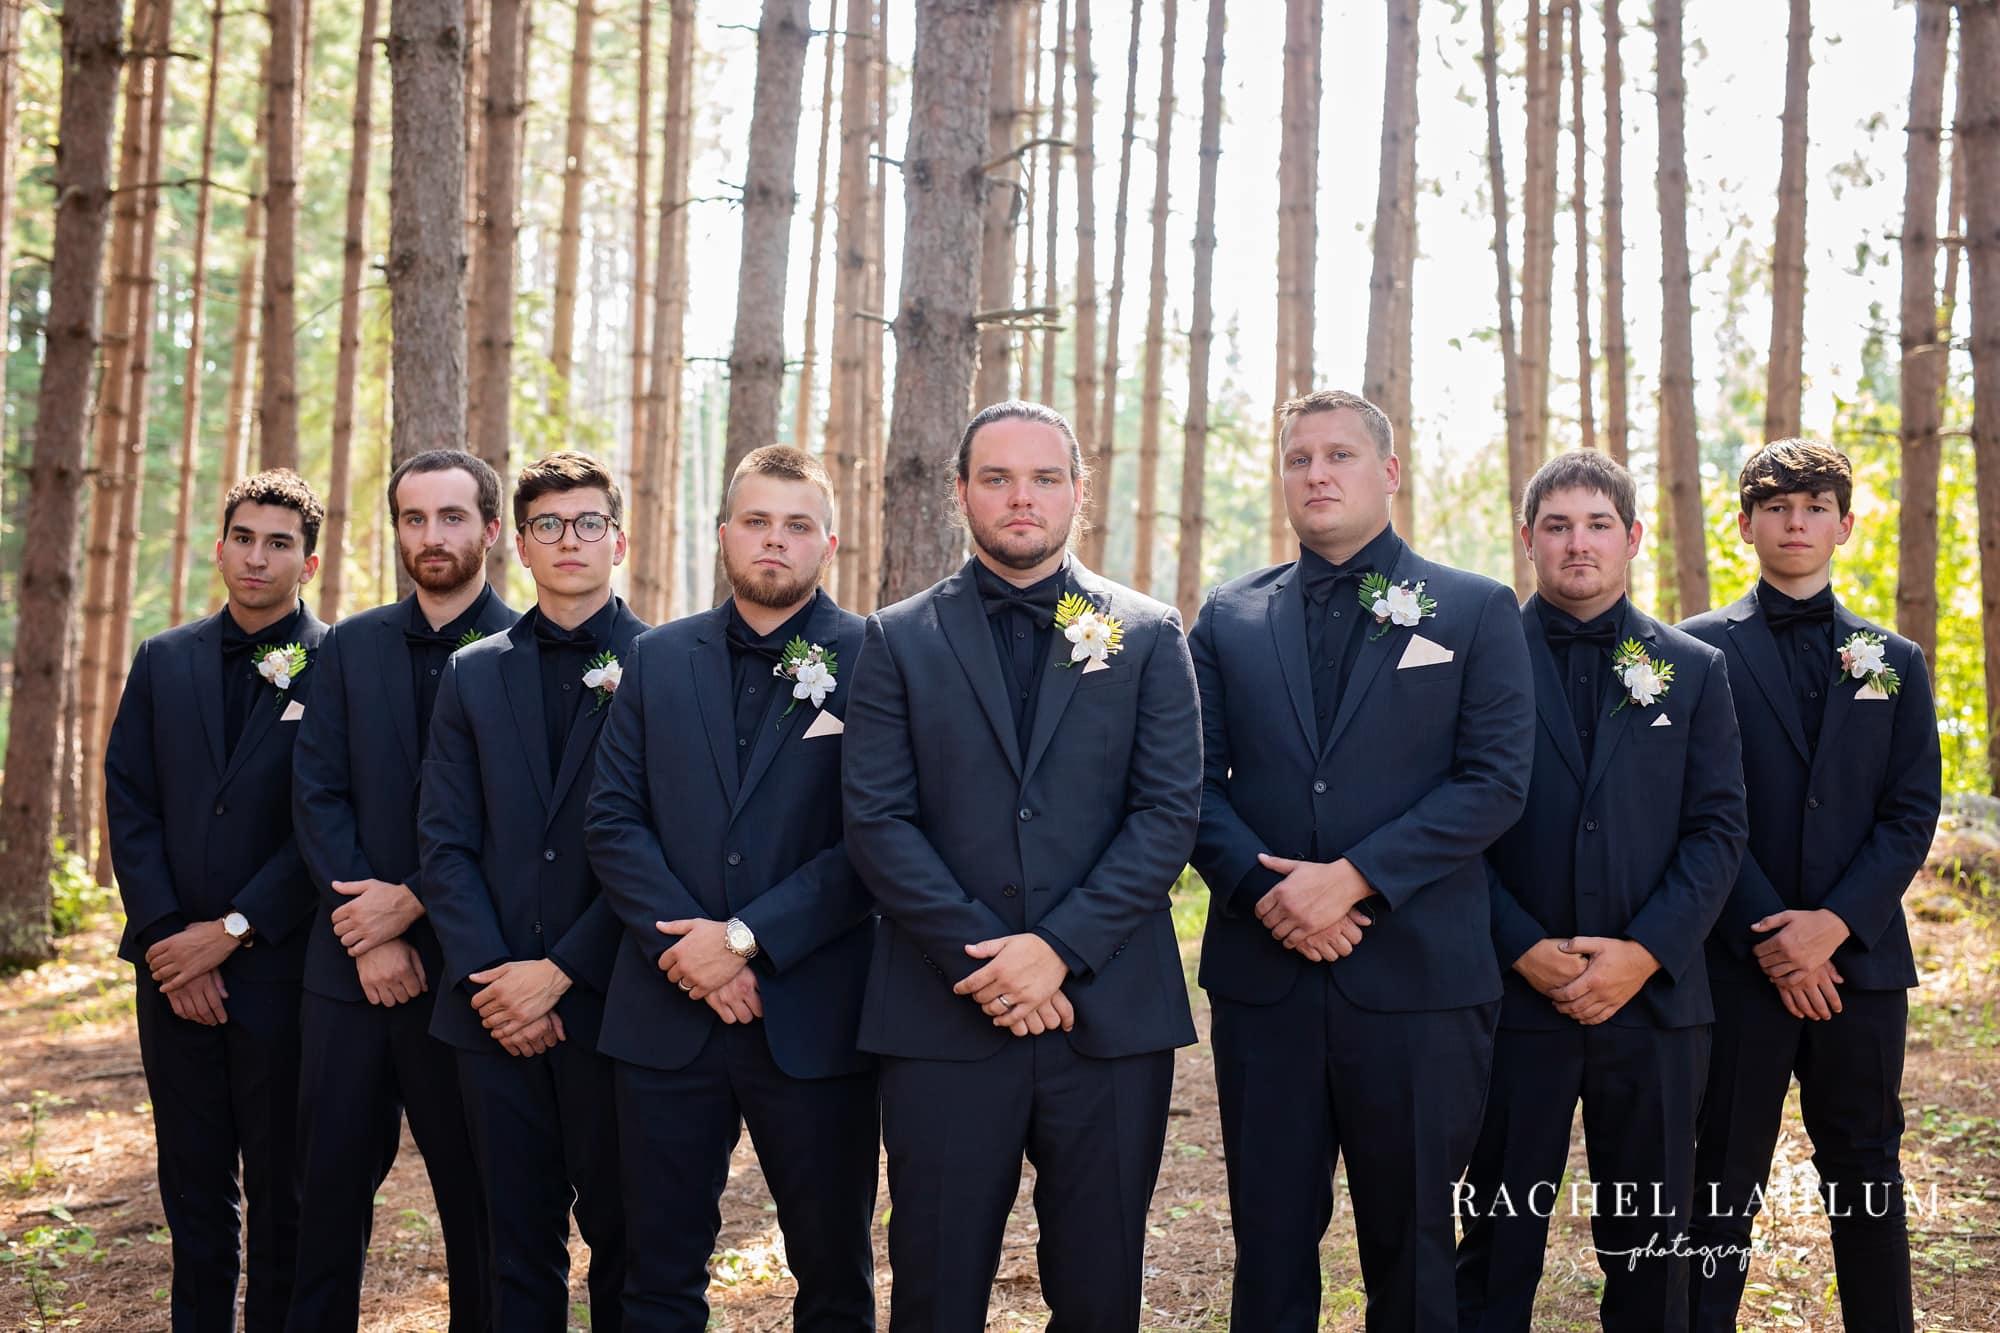 Groom and groomsmen pose before wedding in the woods at the Wilderness Wedding Barn in Bigfork, Minnesota.